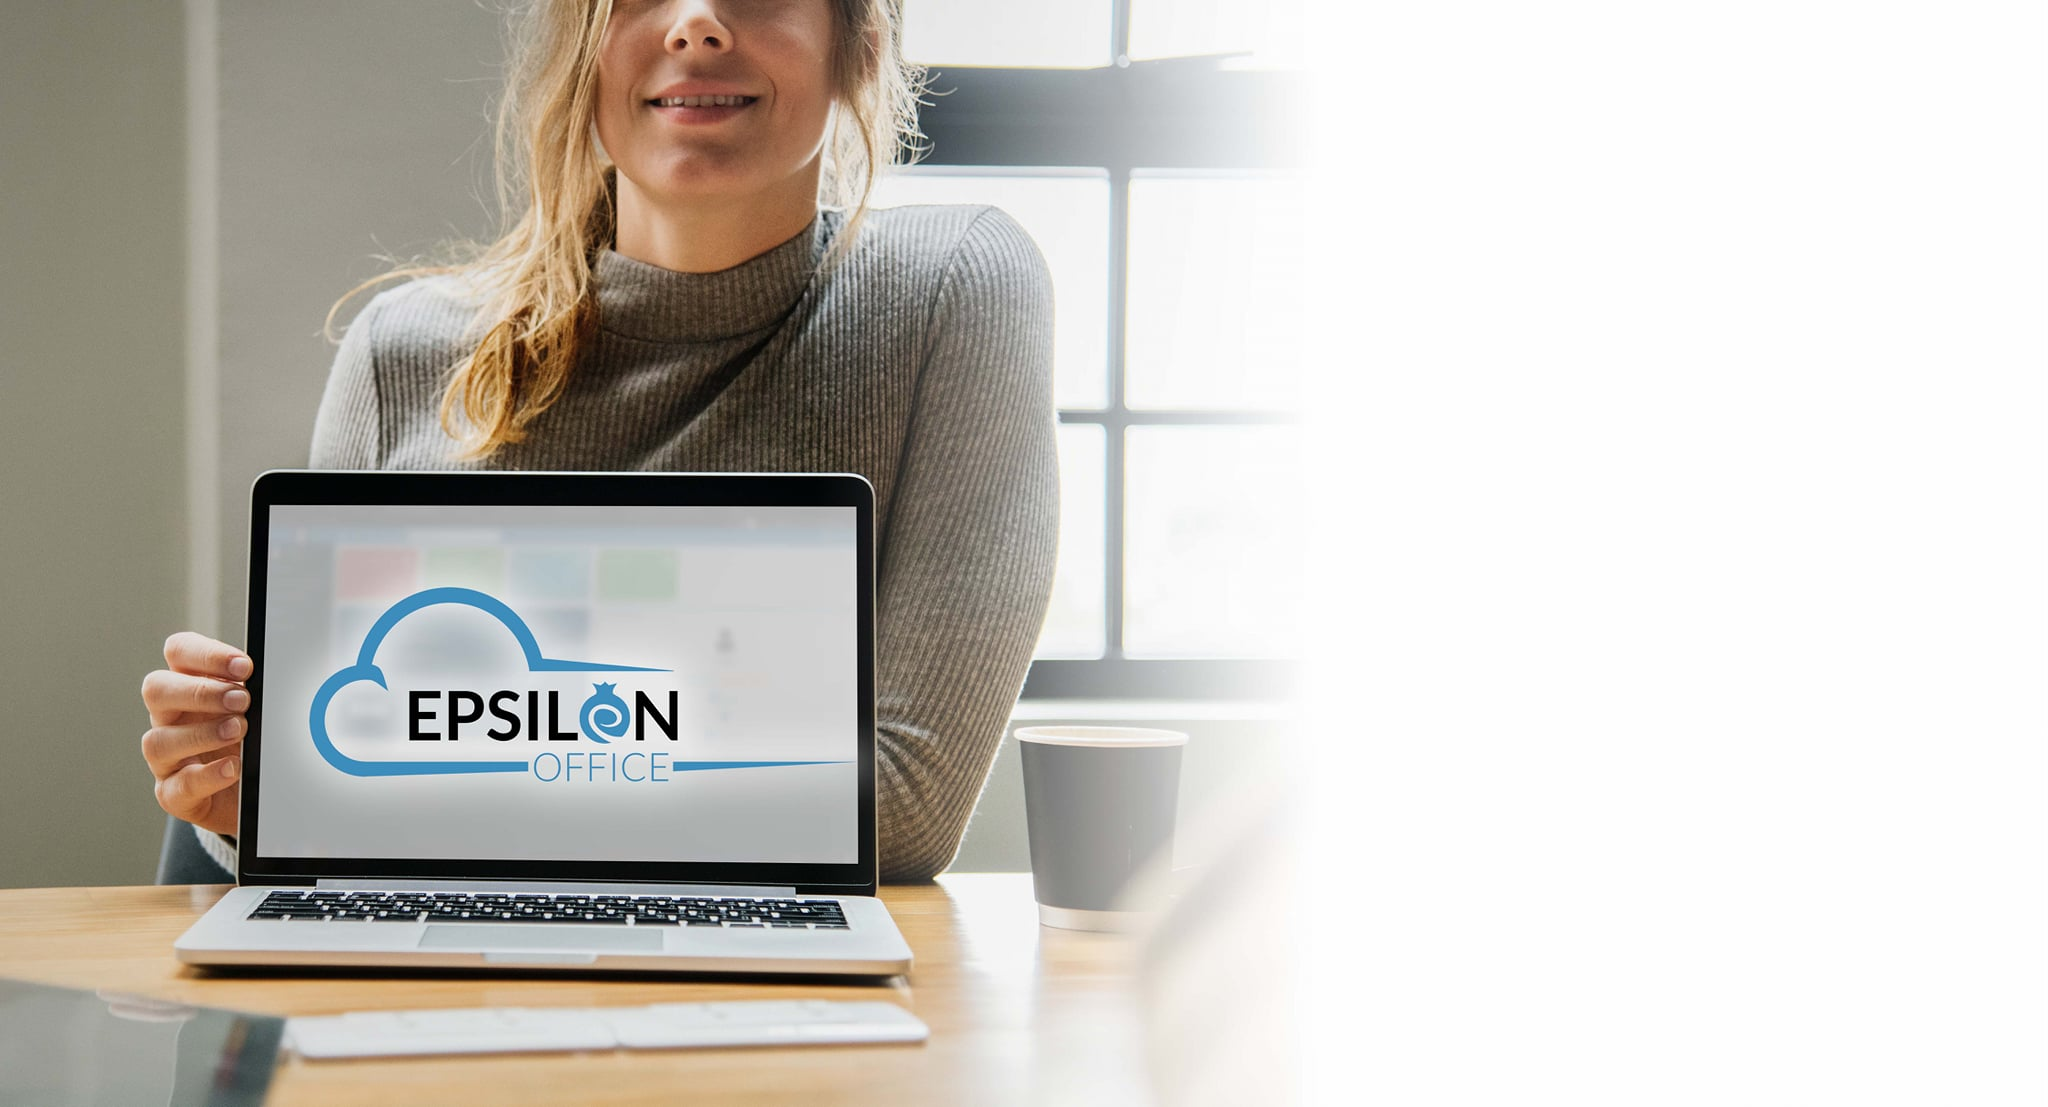 woman showing epsilon office moockup laptop